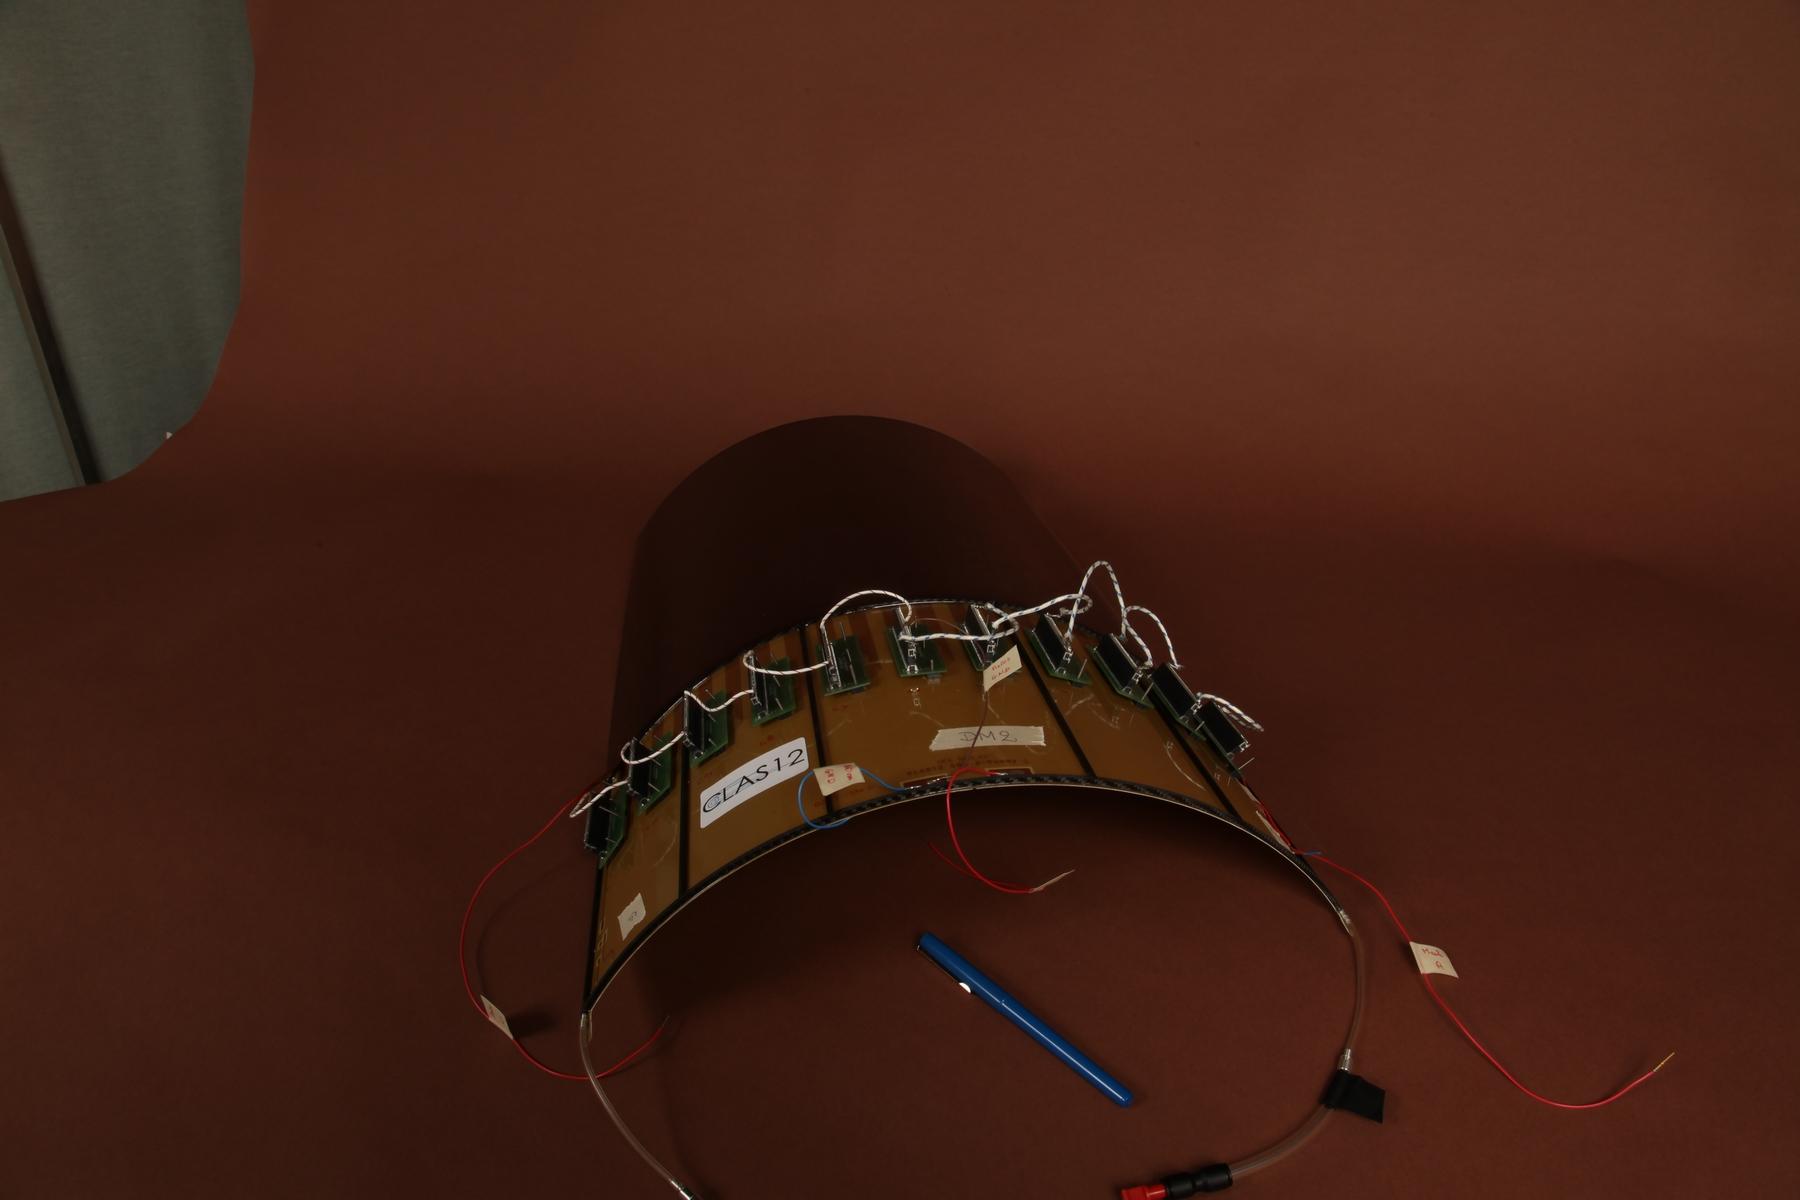 Prototype Micromegas